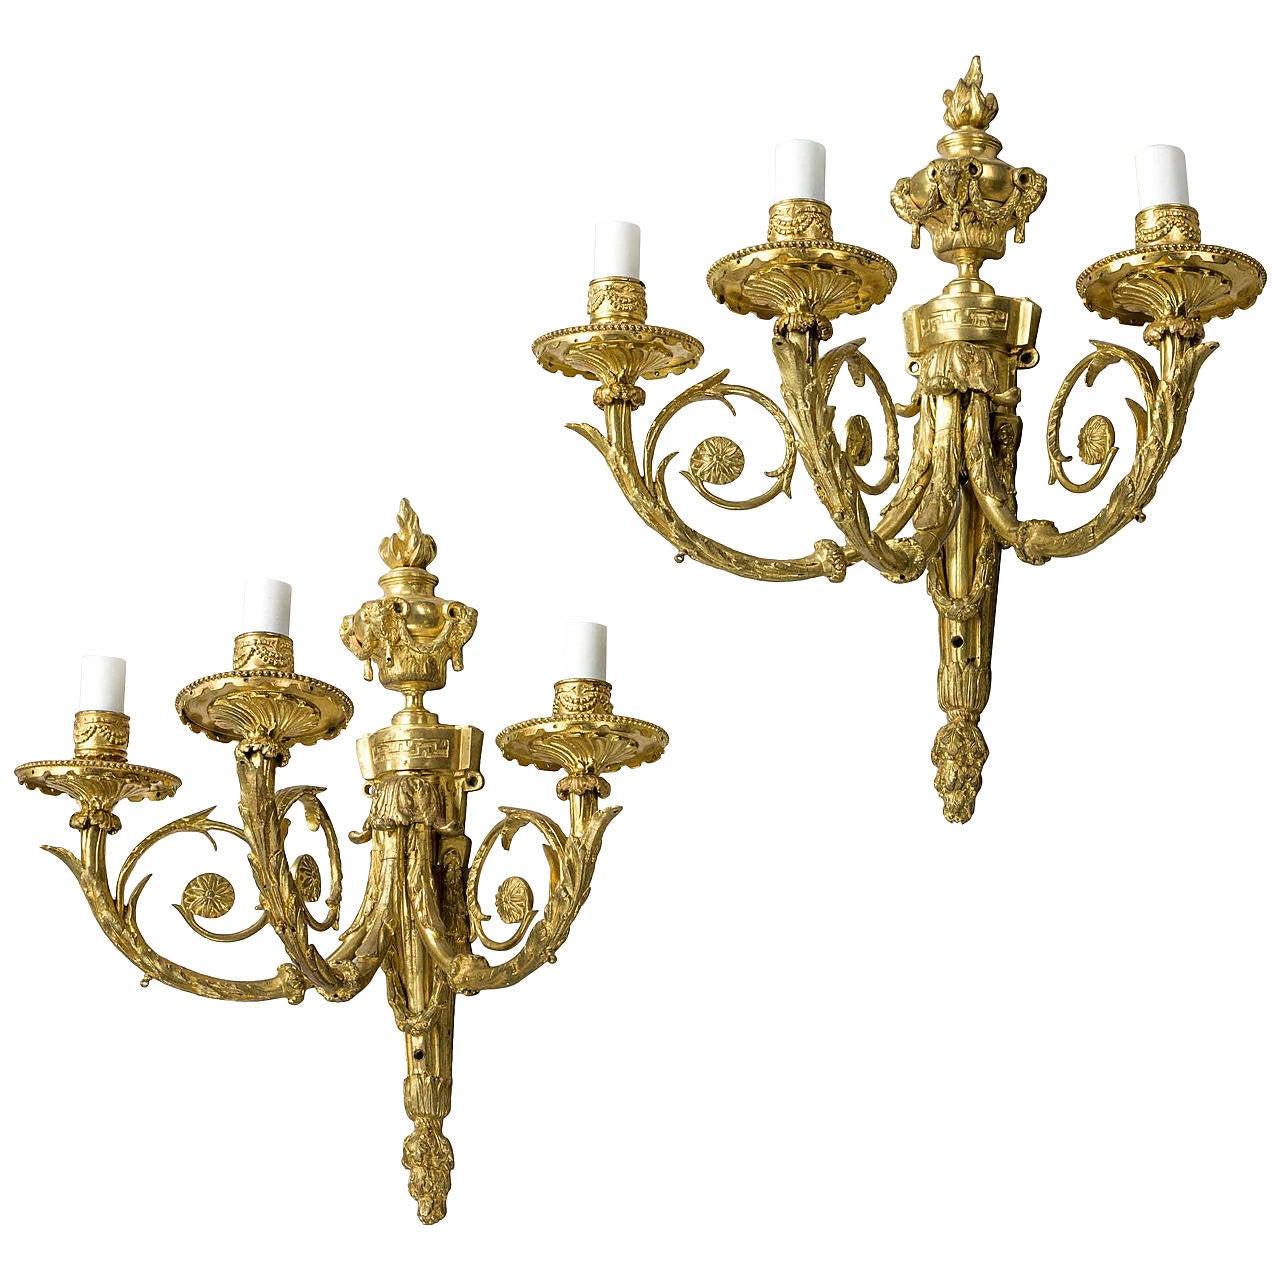 Pair of Three-Arm Late 19th Century Wall Lights